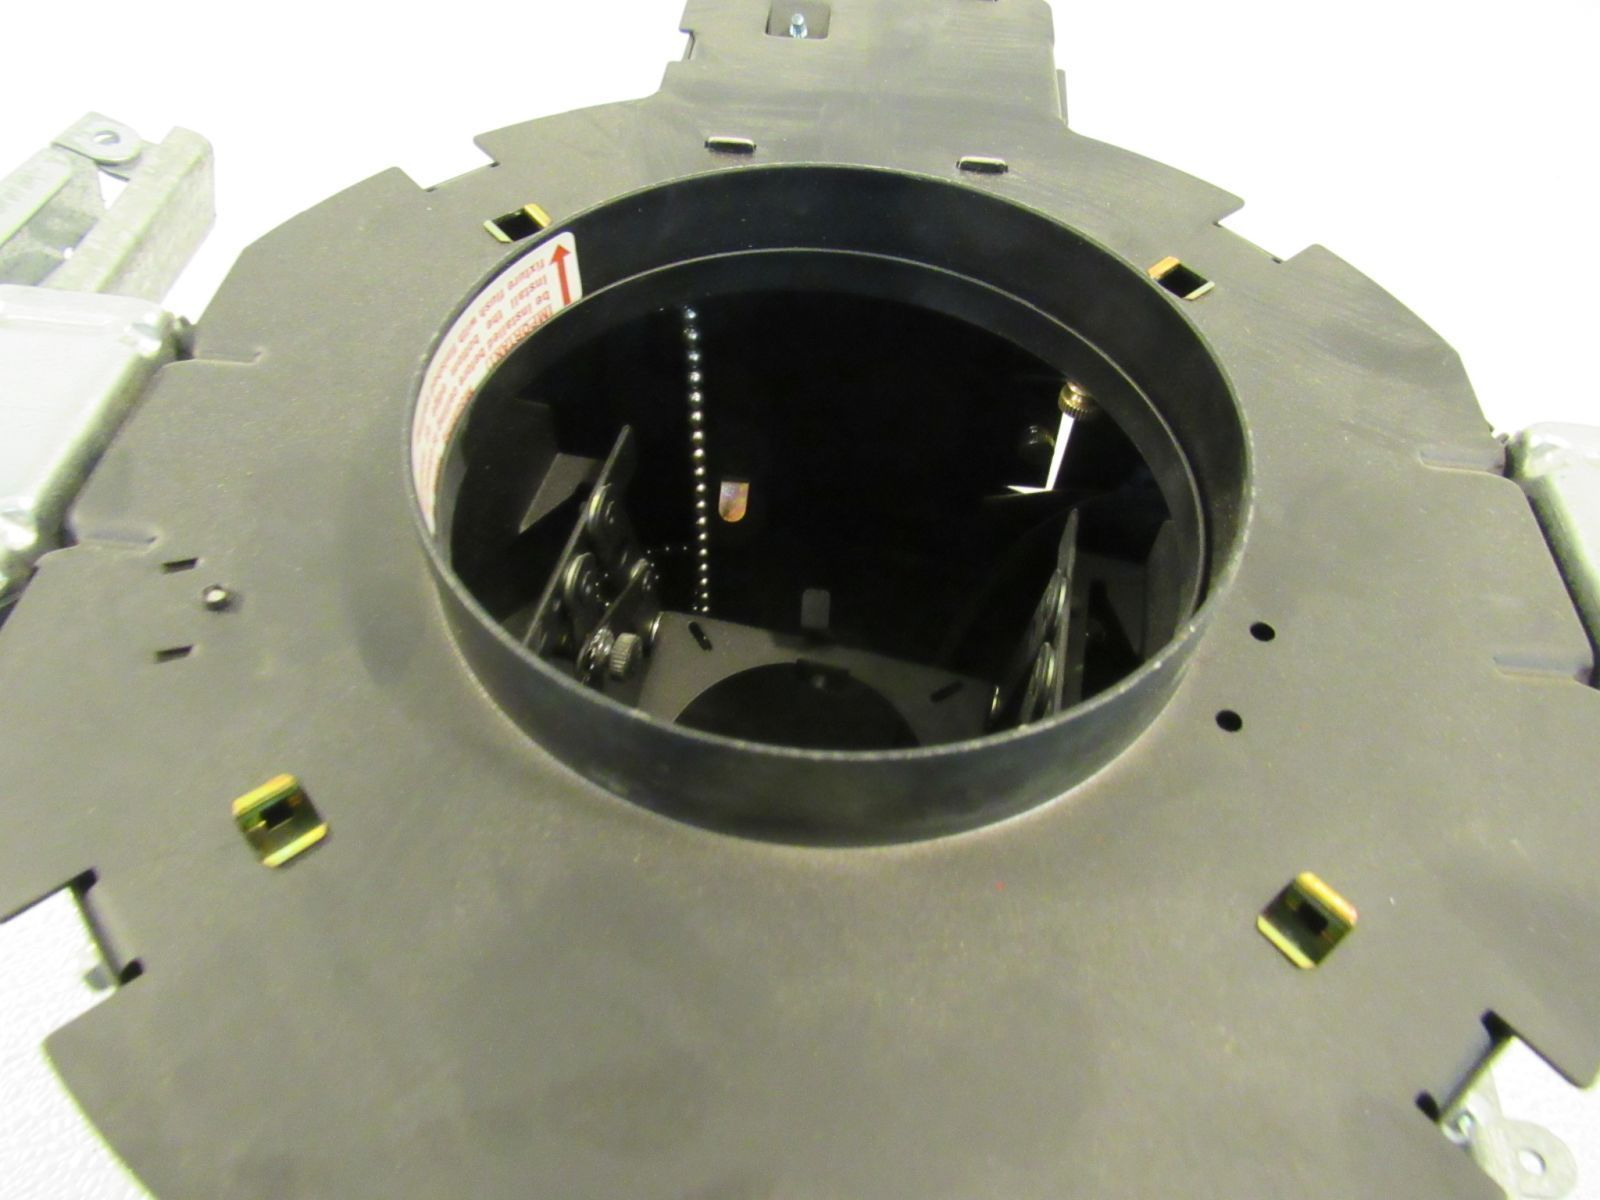 Lithonia Low Voltage Adjustable Housing 4in 120 Volt DLV ADJ 4 120 HSG